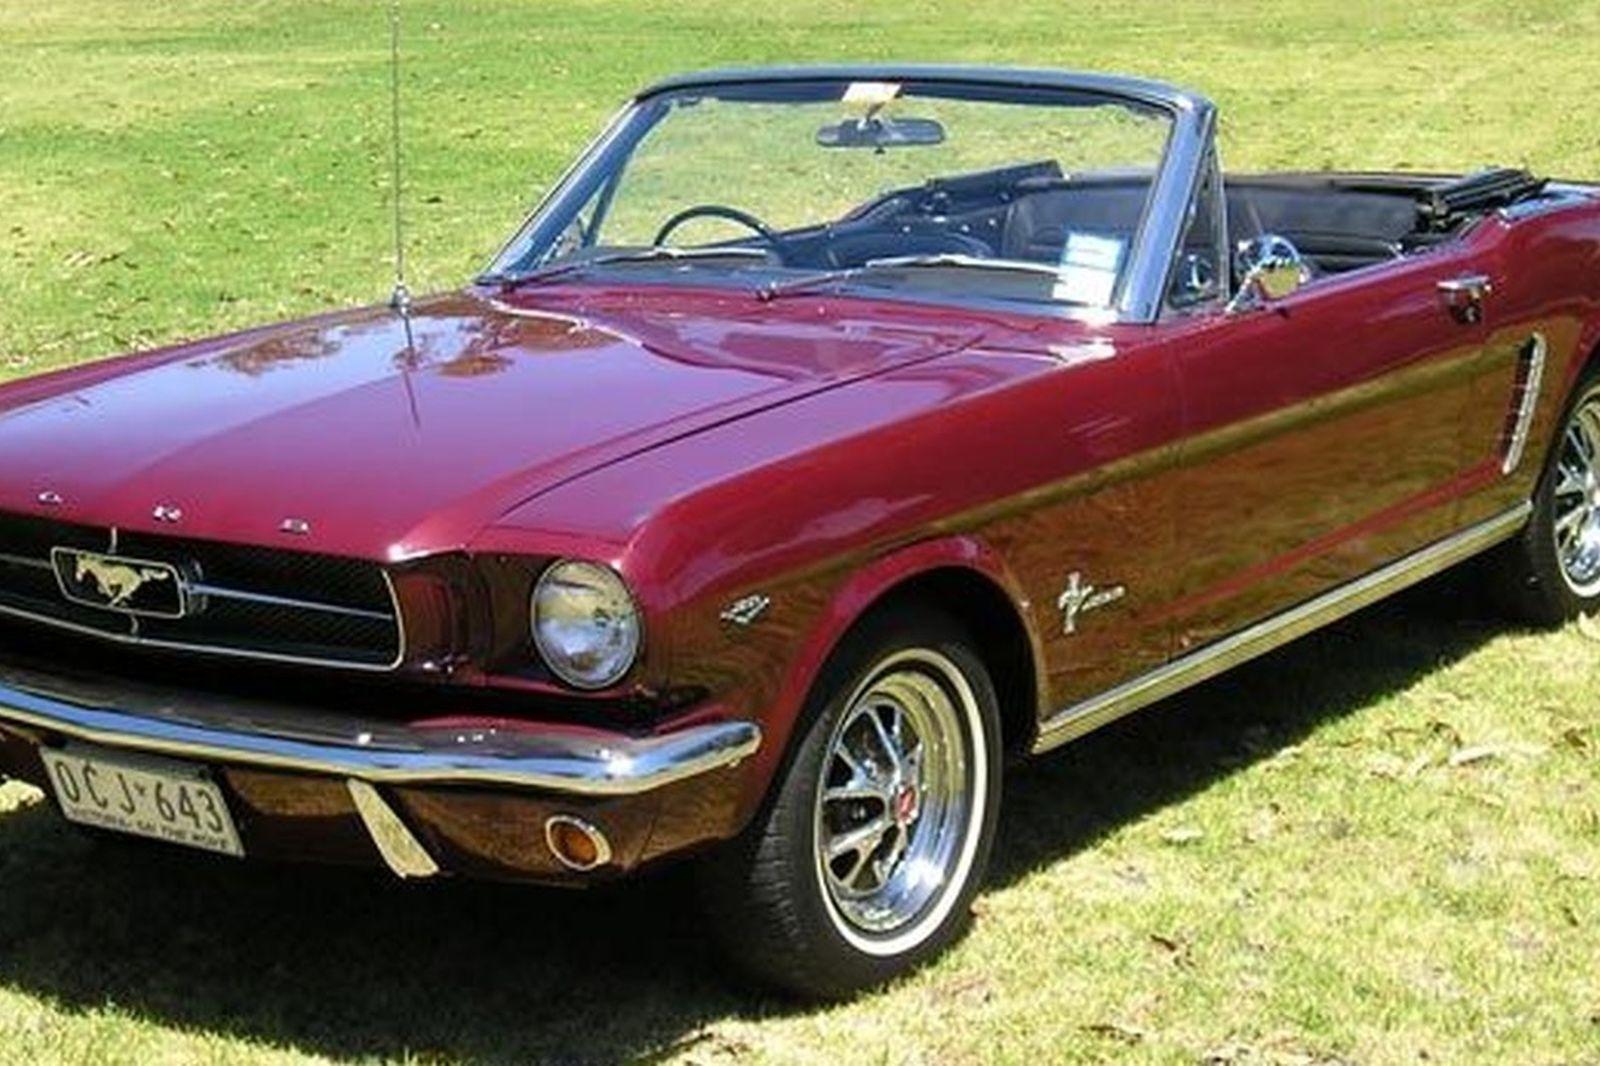 Ford Mustang Convertible (RHD)